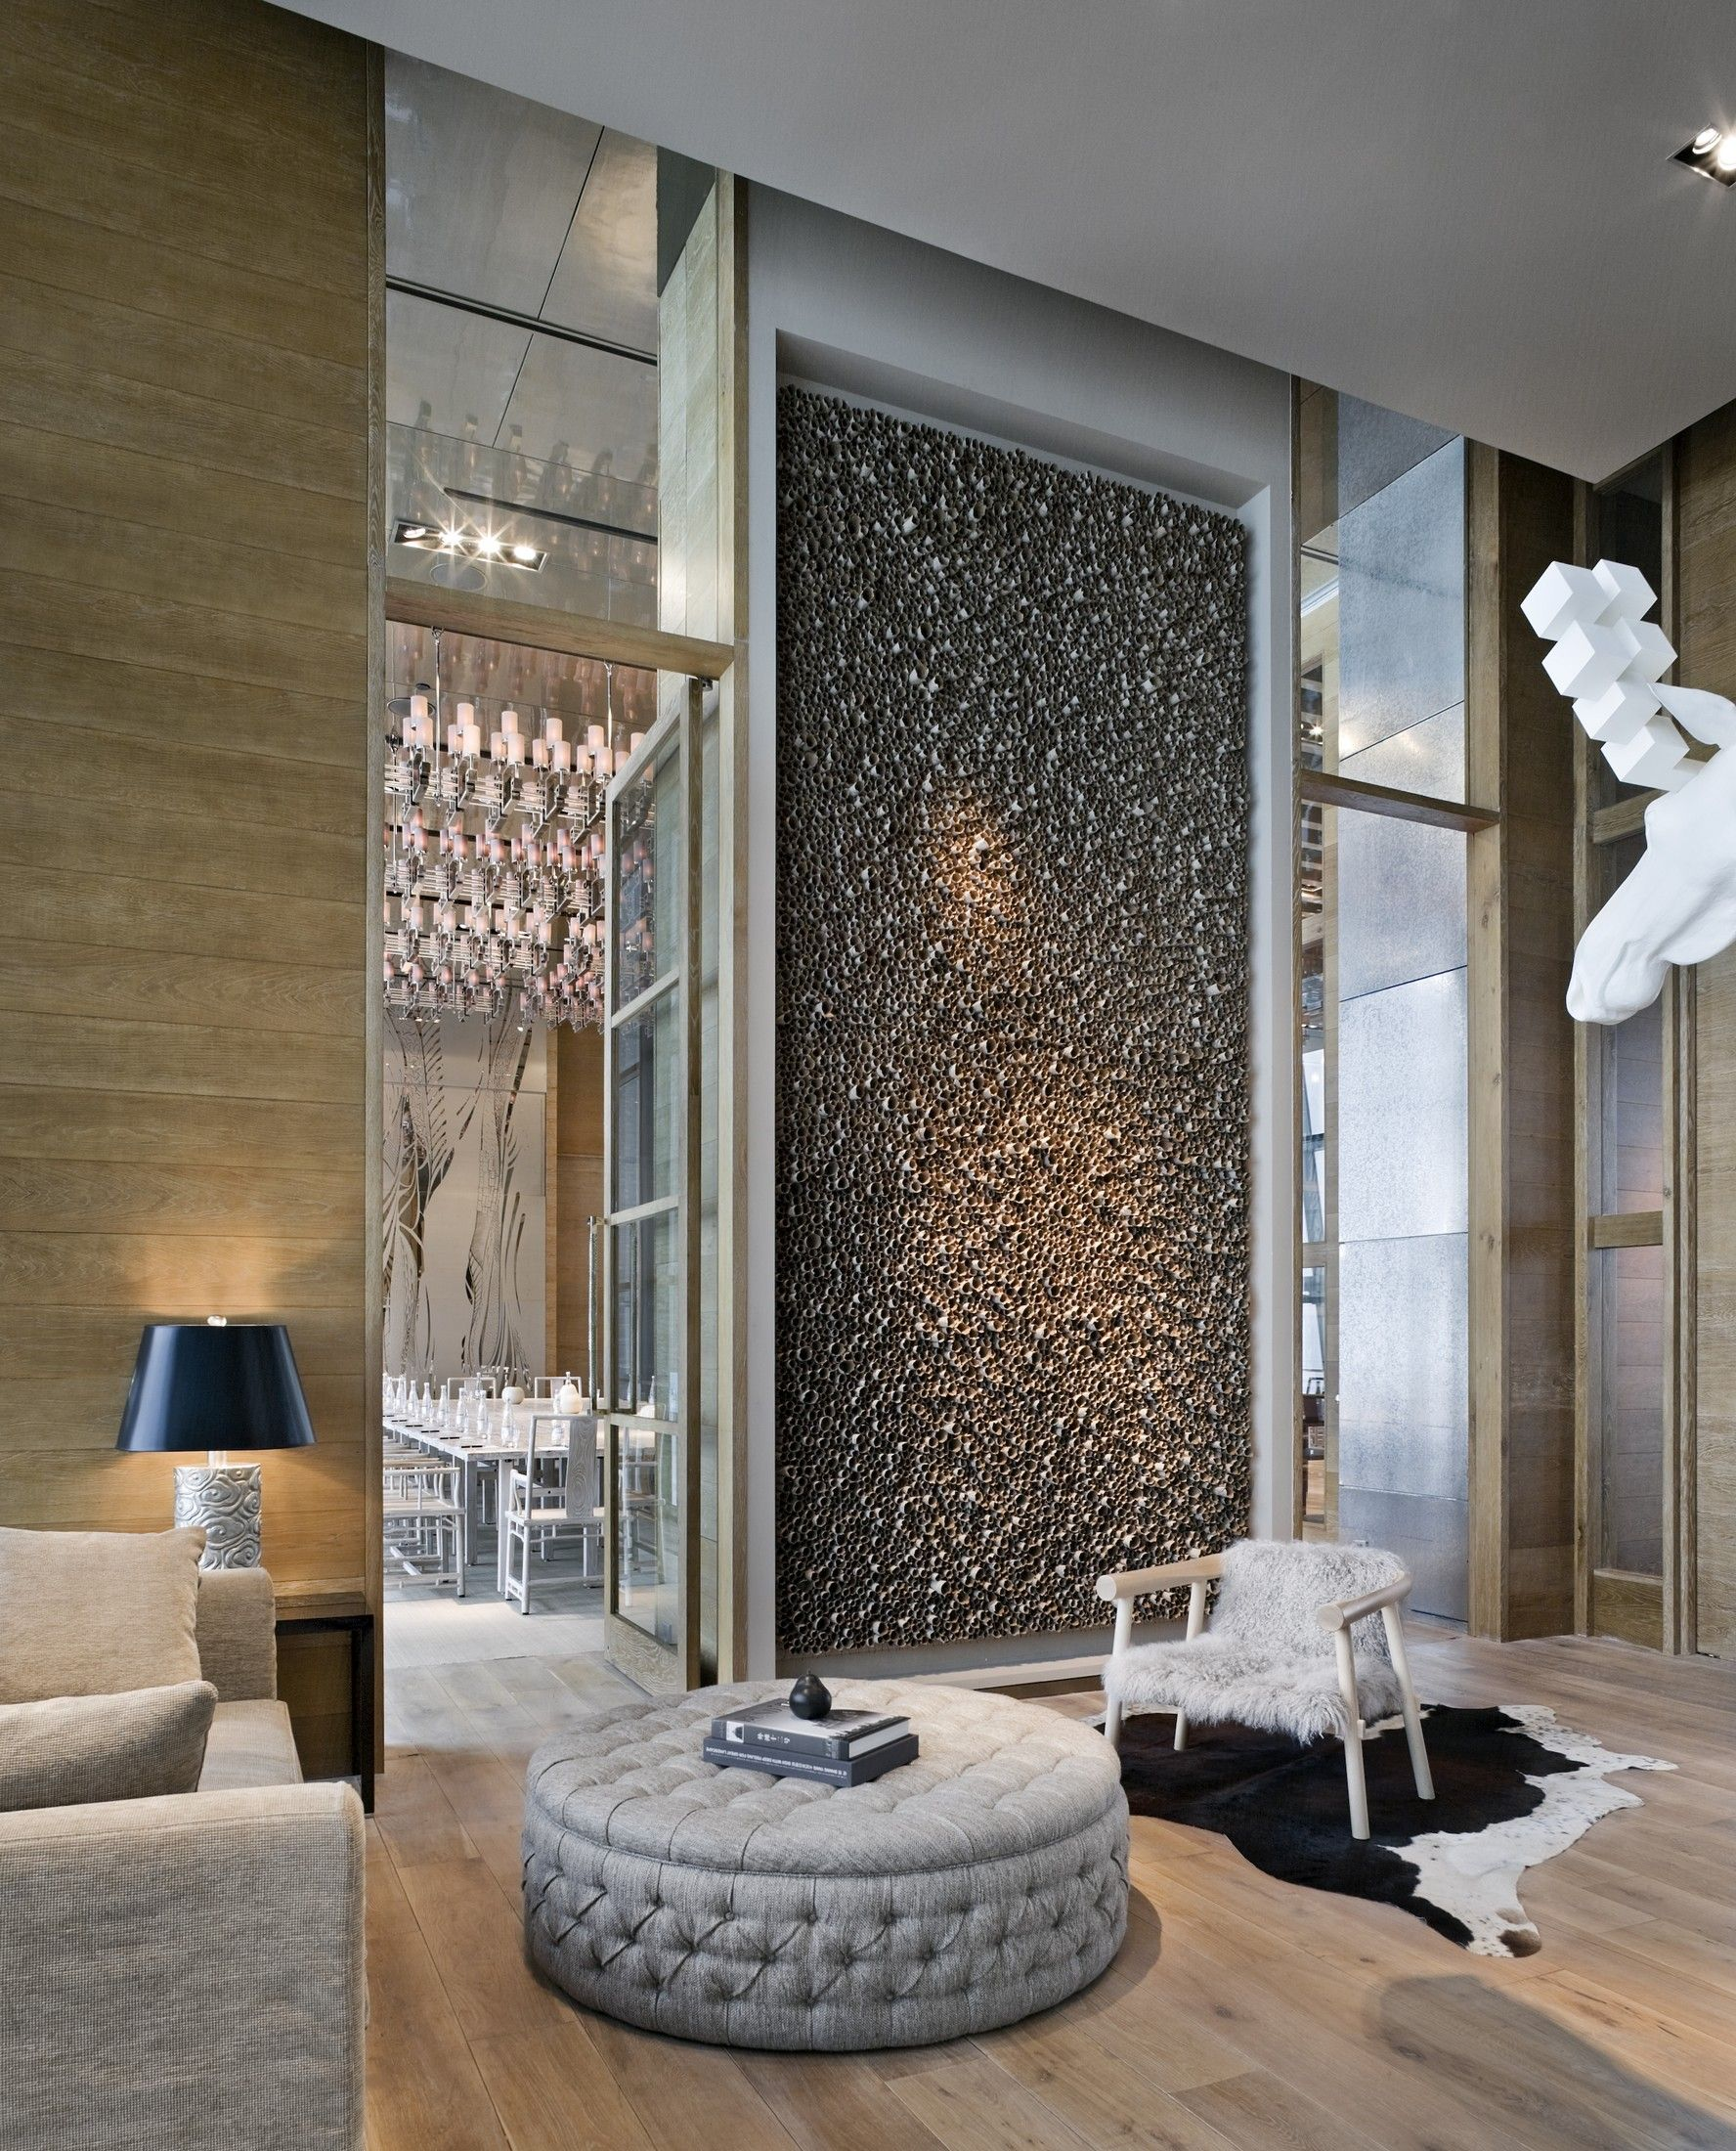 3d Wall Tiles Interiors